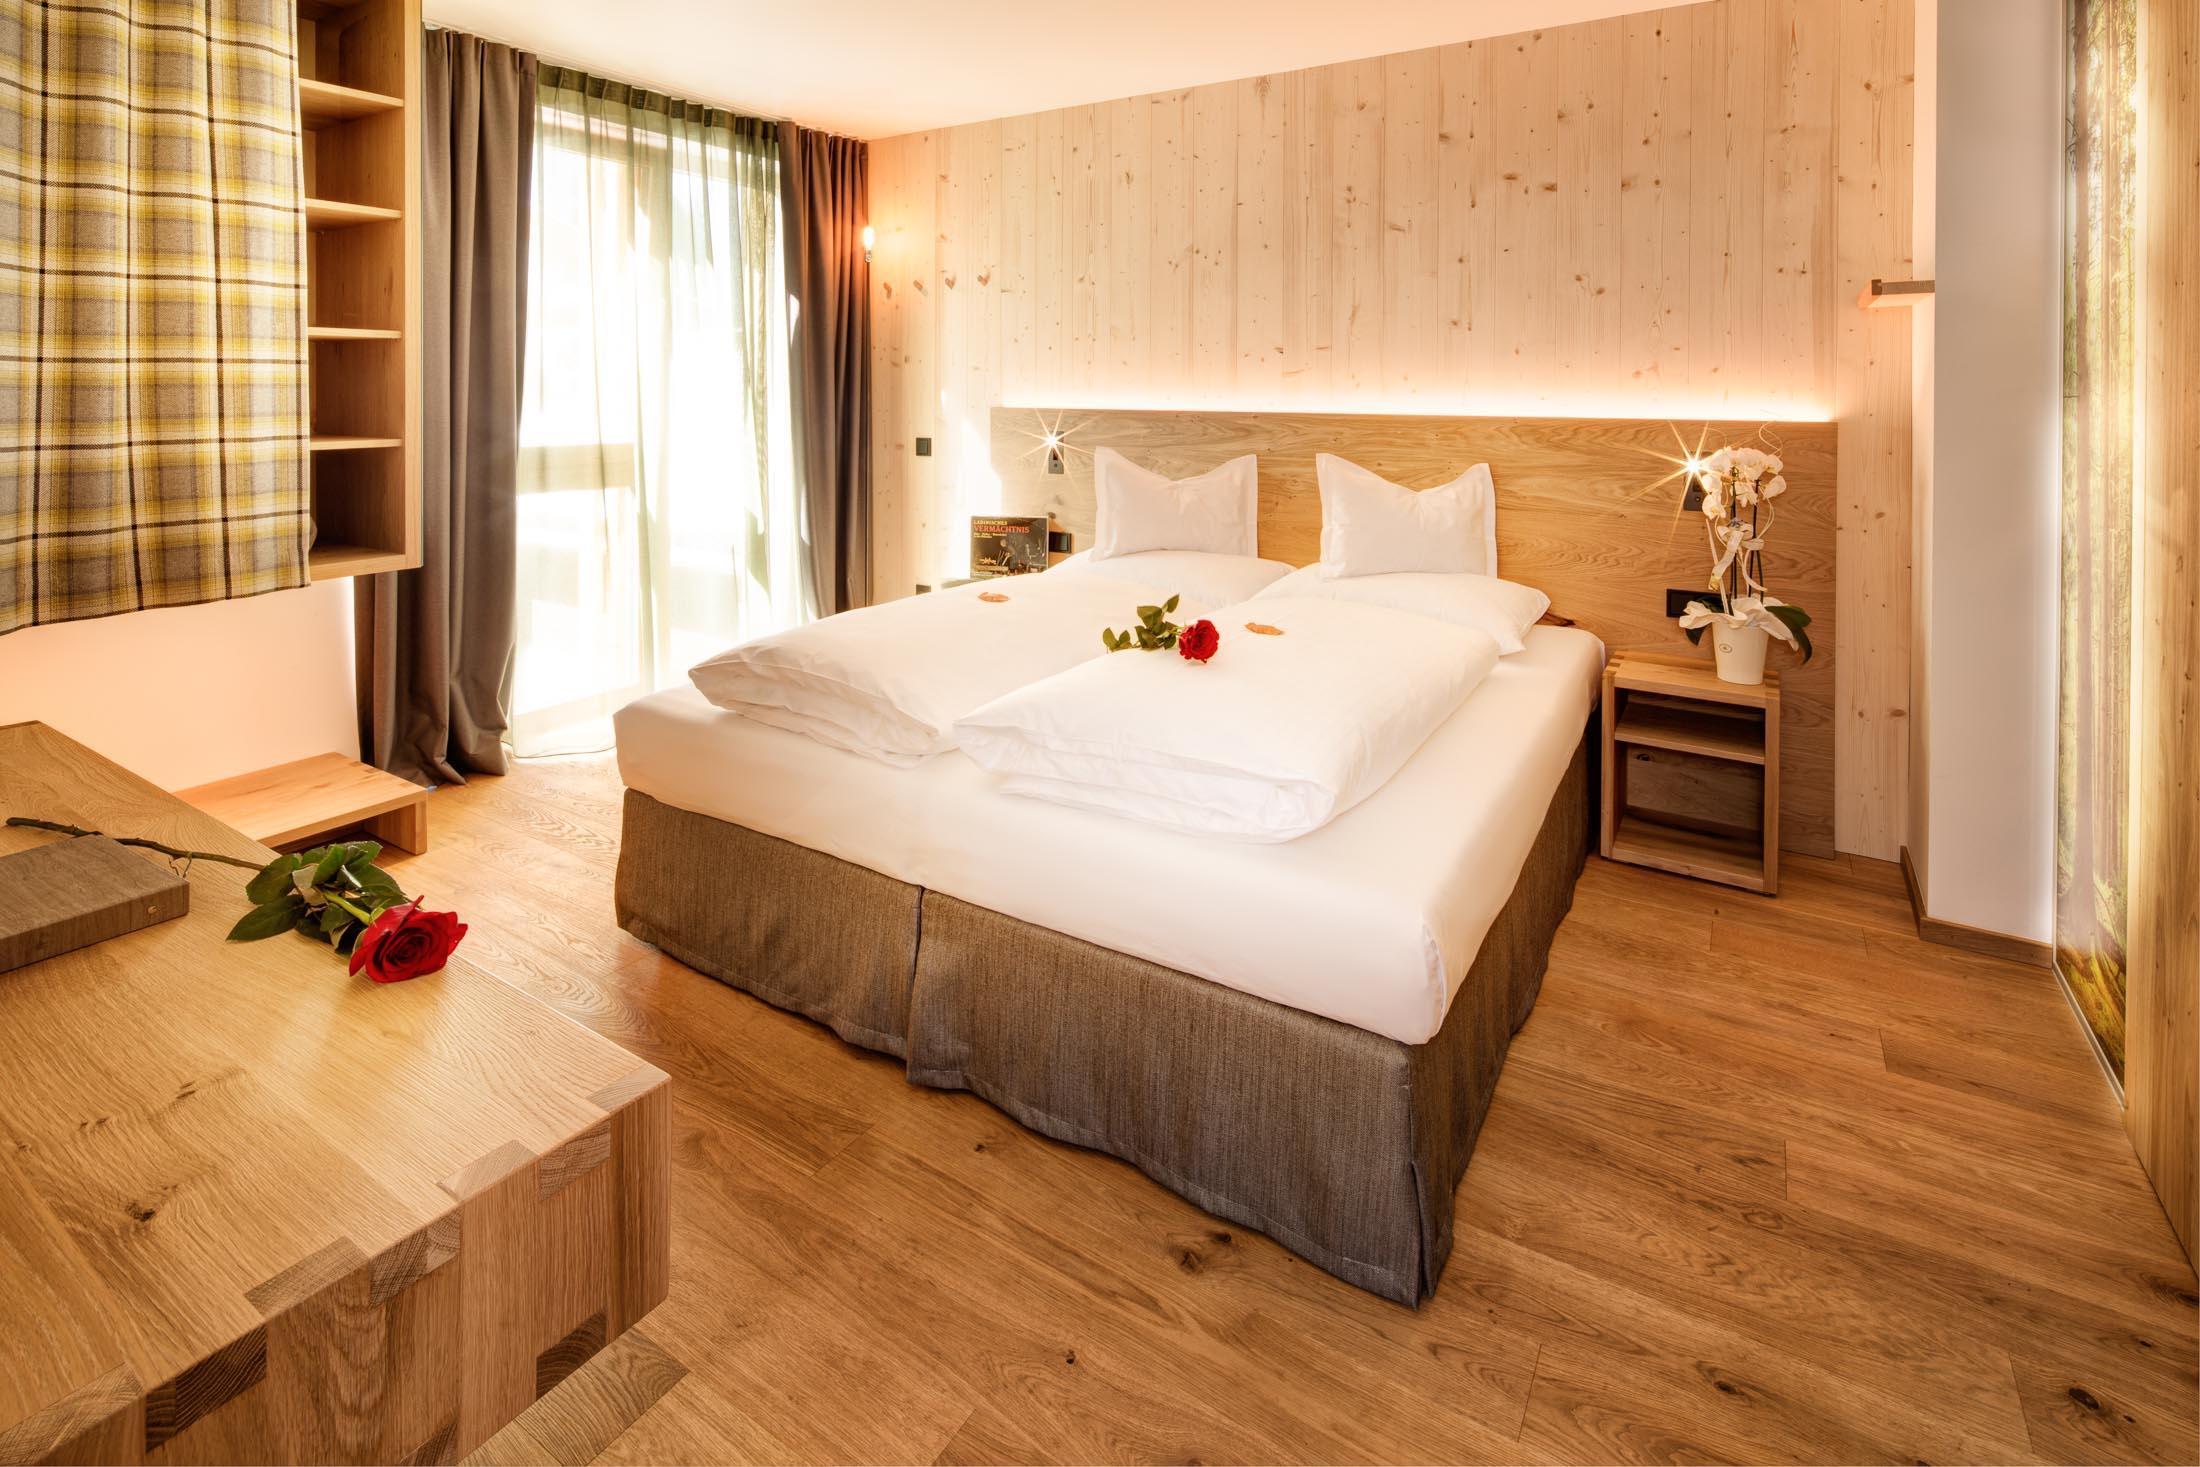 Eden selva mountain design hotel selva di val gardena for Design hotel eden selva